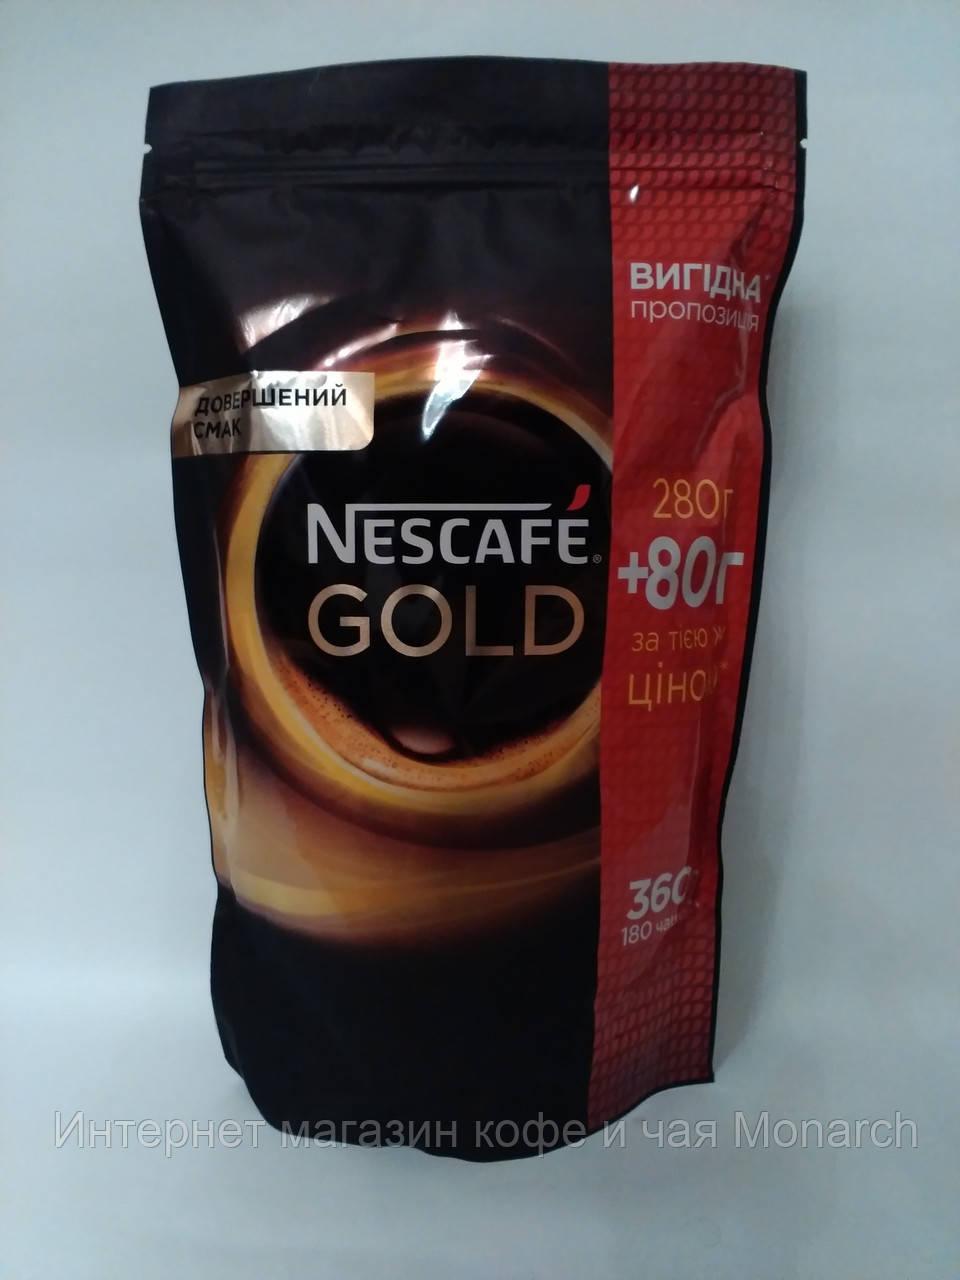 Кофе Nescafe Gold 360 г \ Нескафе Голд 280+80